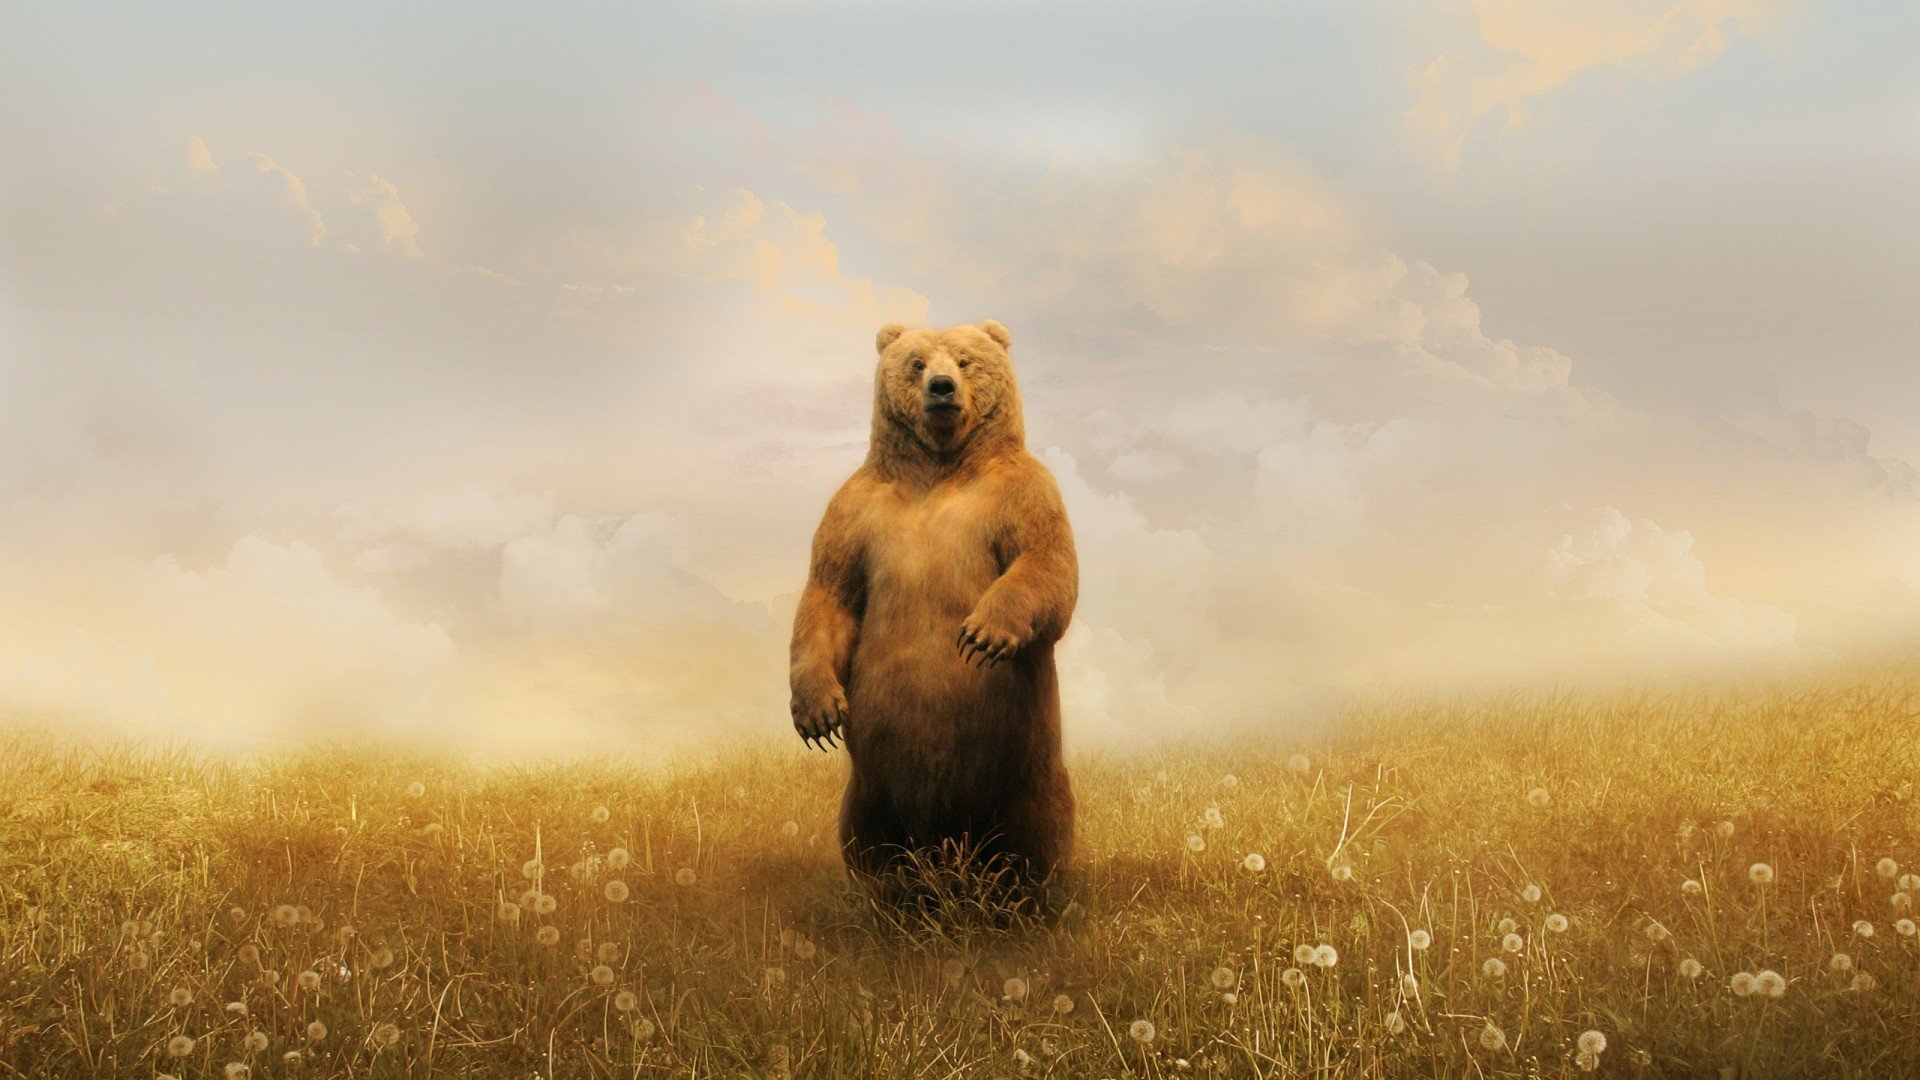 Cute Cockatiel Wallpaper Bear In Field Hd Animals 4k Wallpapers Images